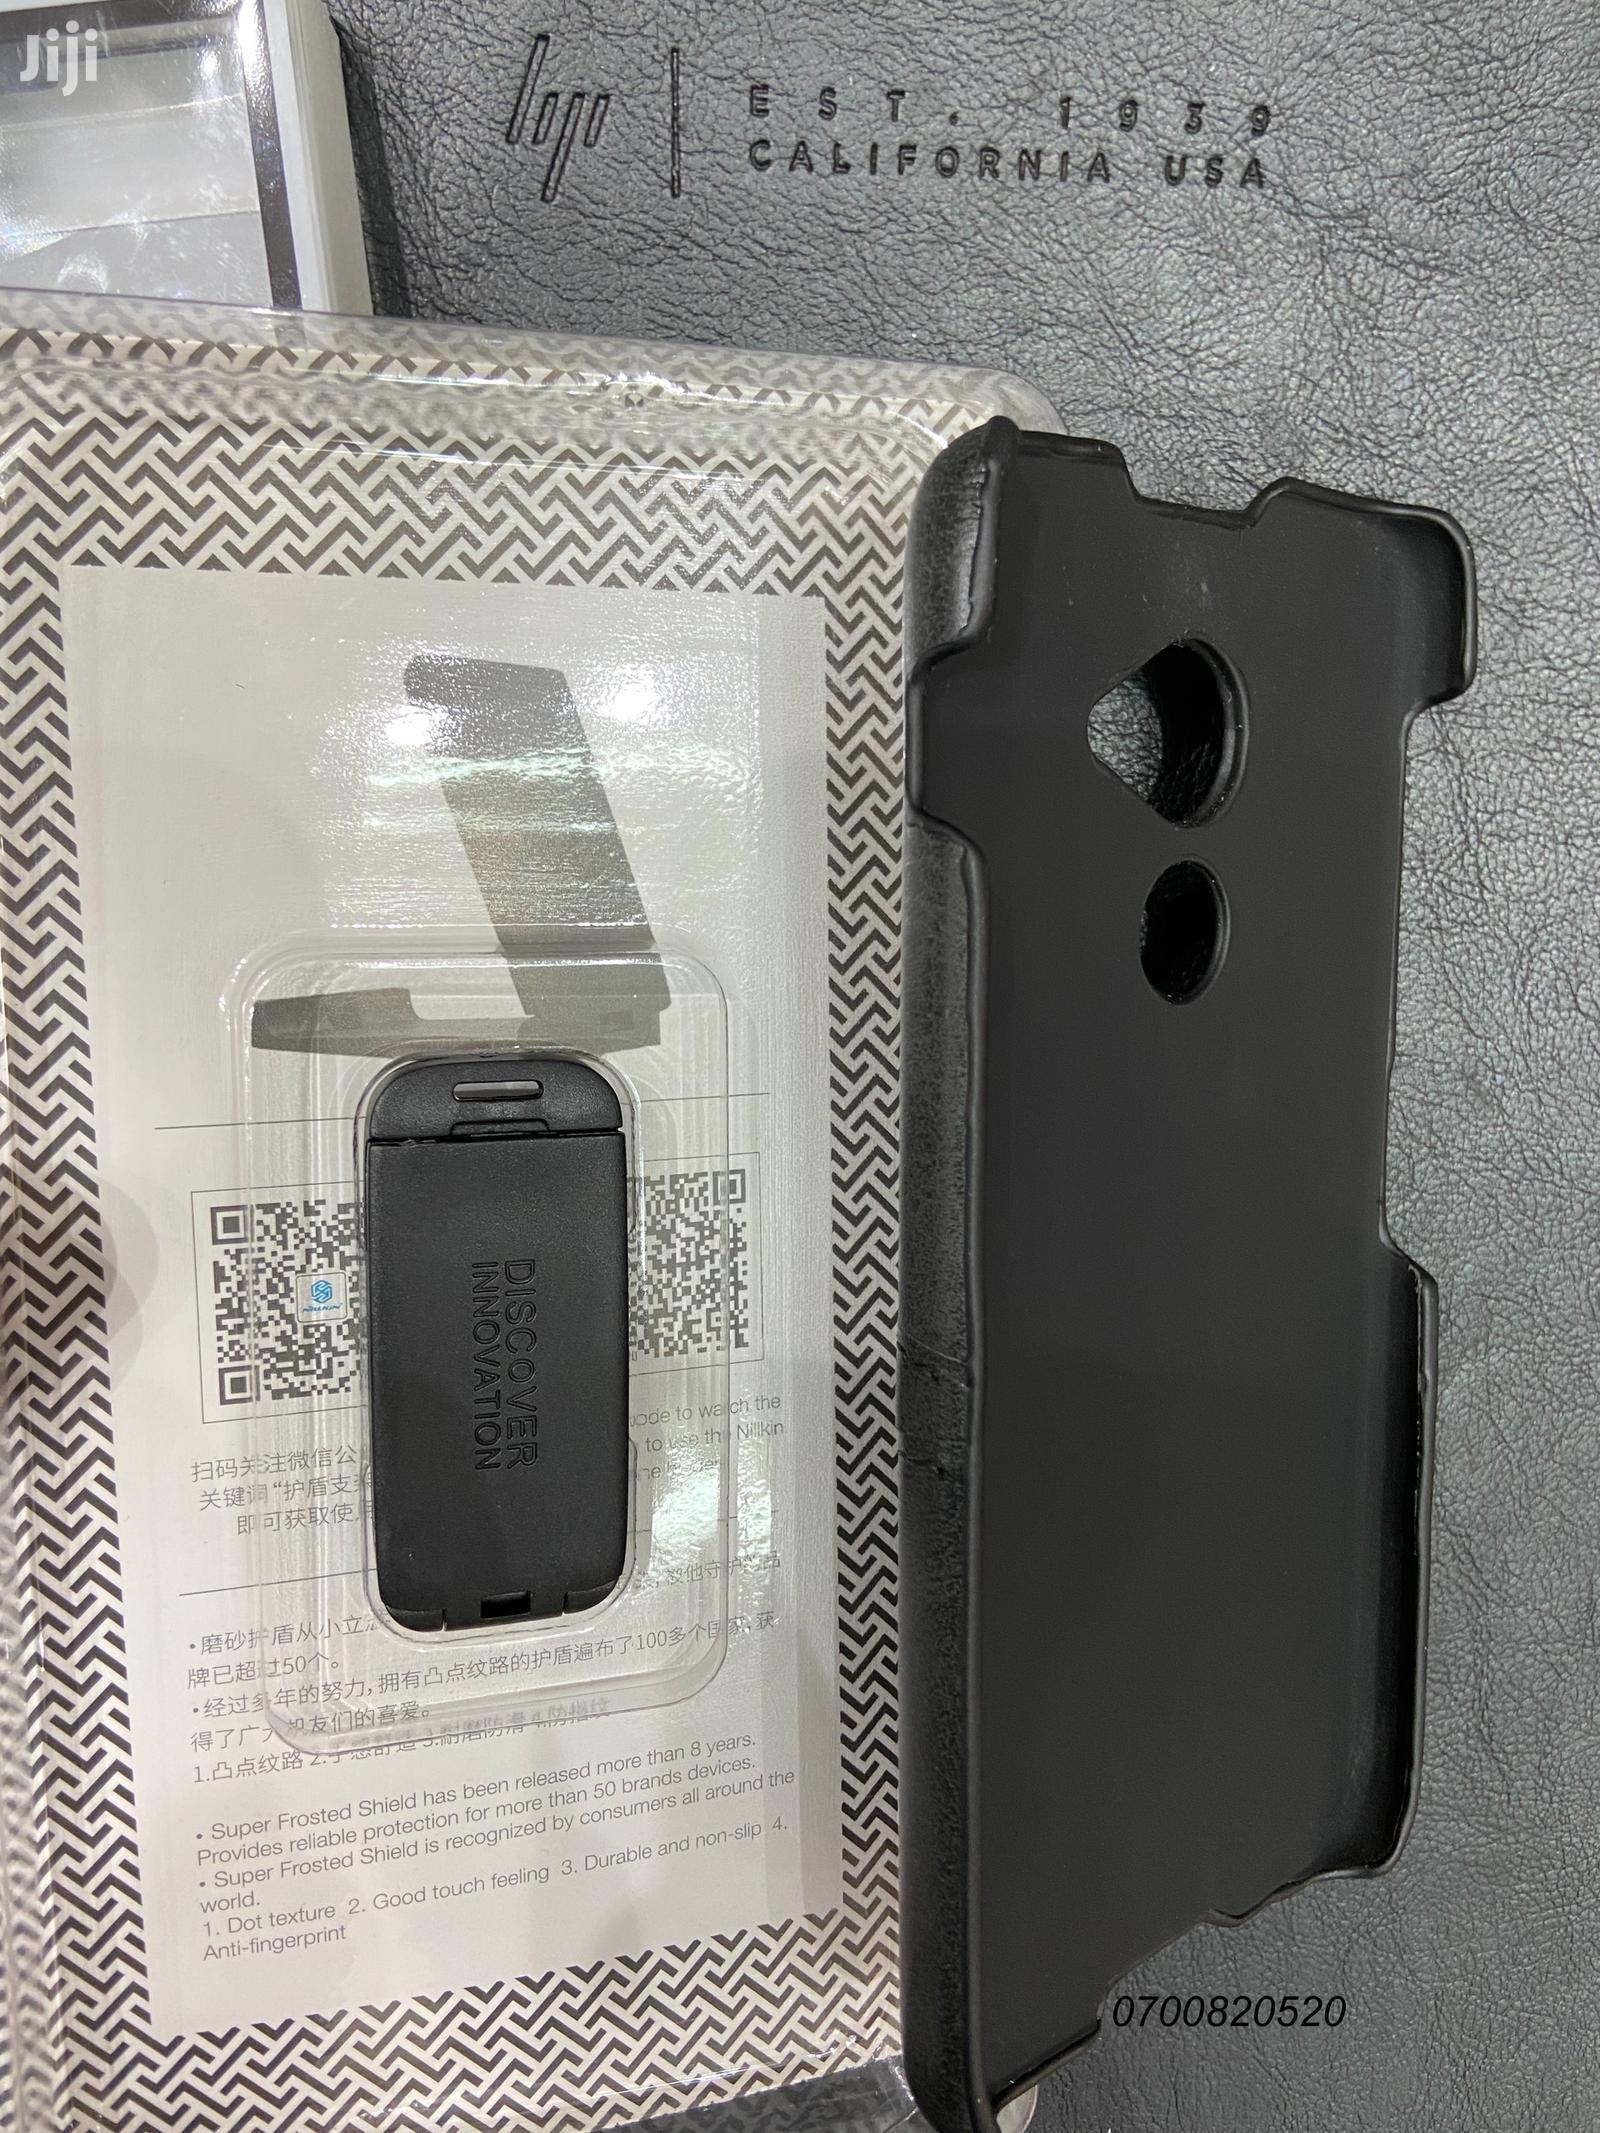 Blackberry DTEK60 Super Frosted Shield,Matte Finish | Accessories for Mobile Phones & Tablets for sale in Nairobi Central, Nairobi, Kenya